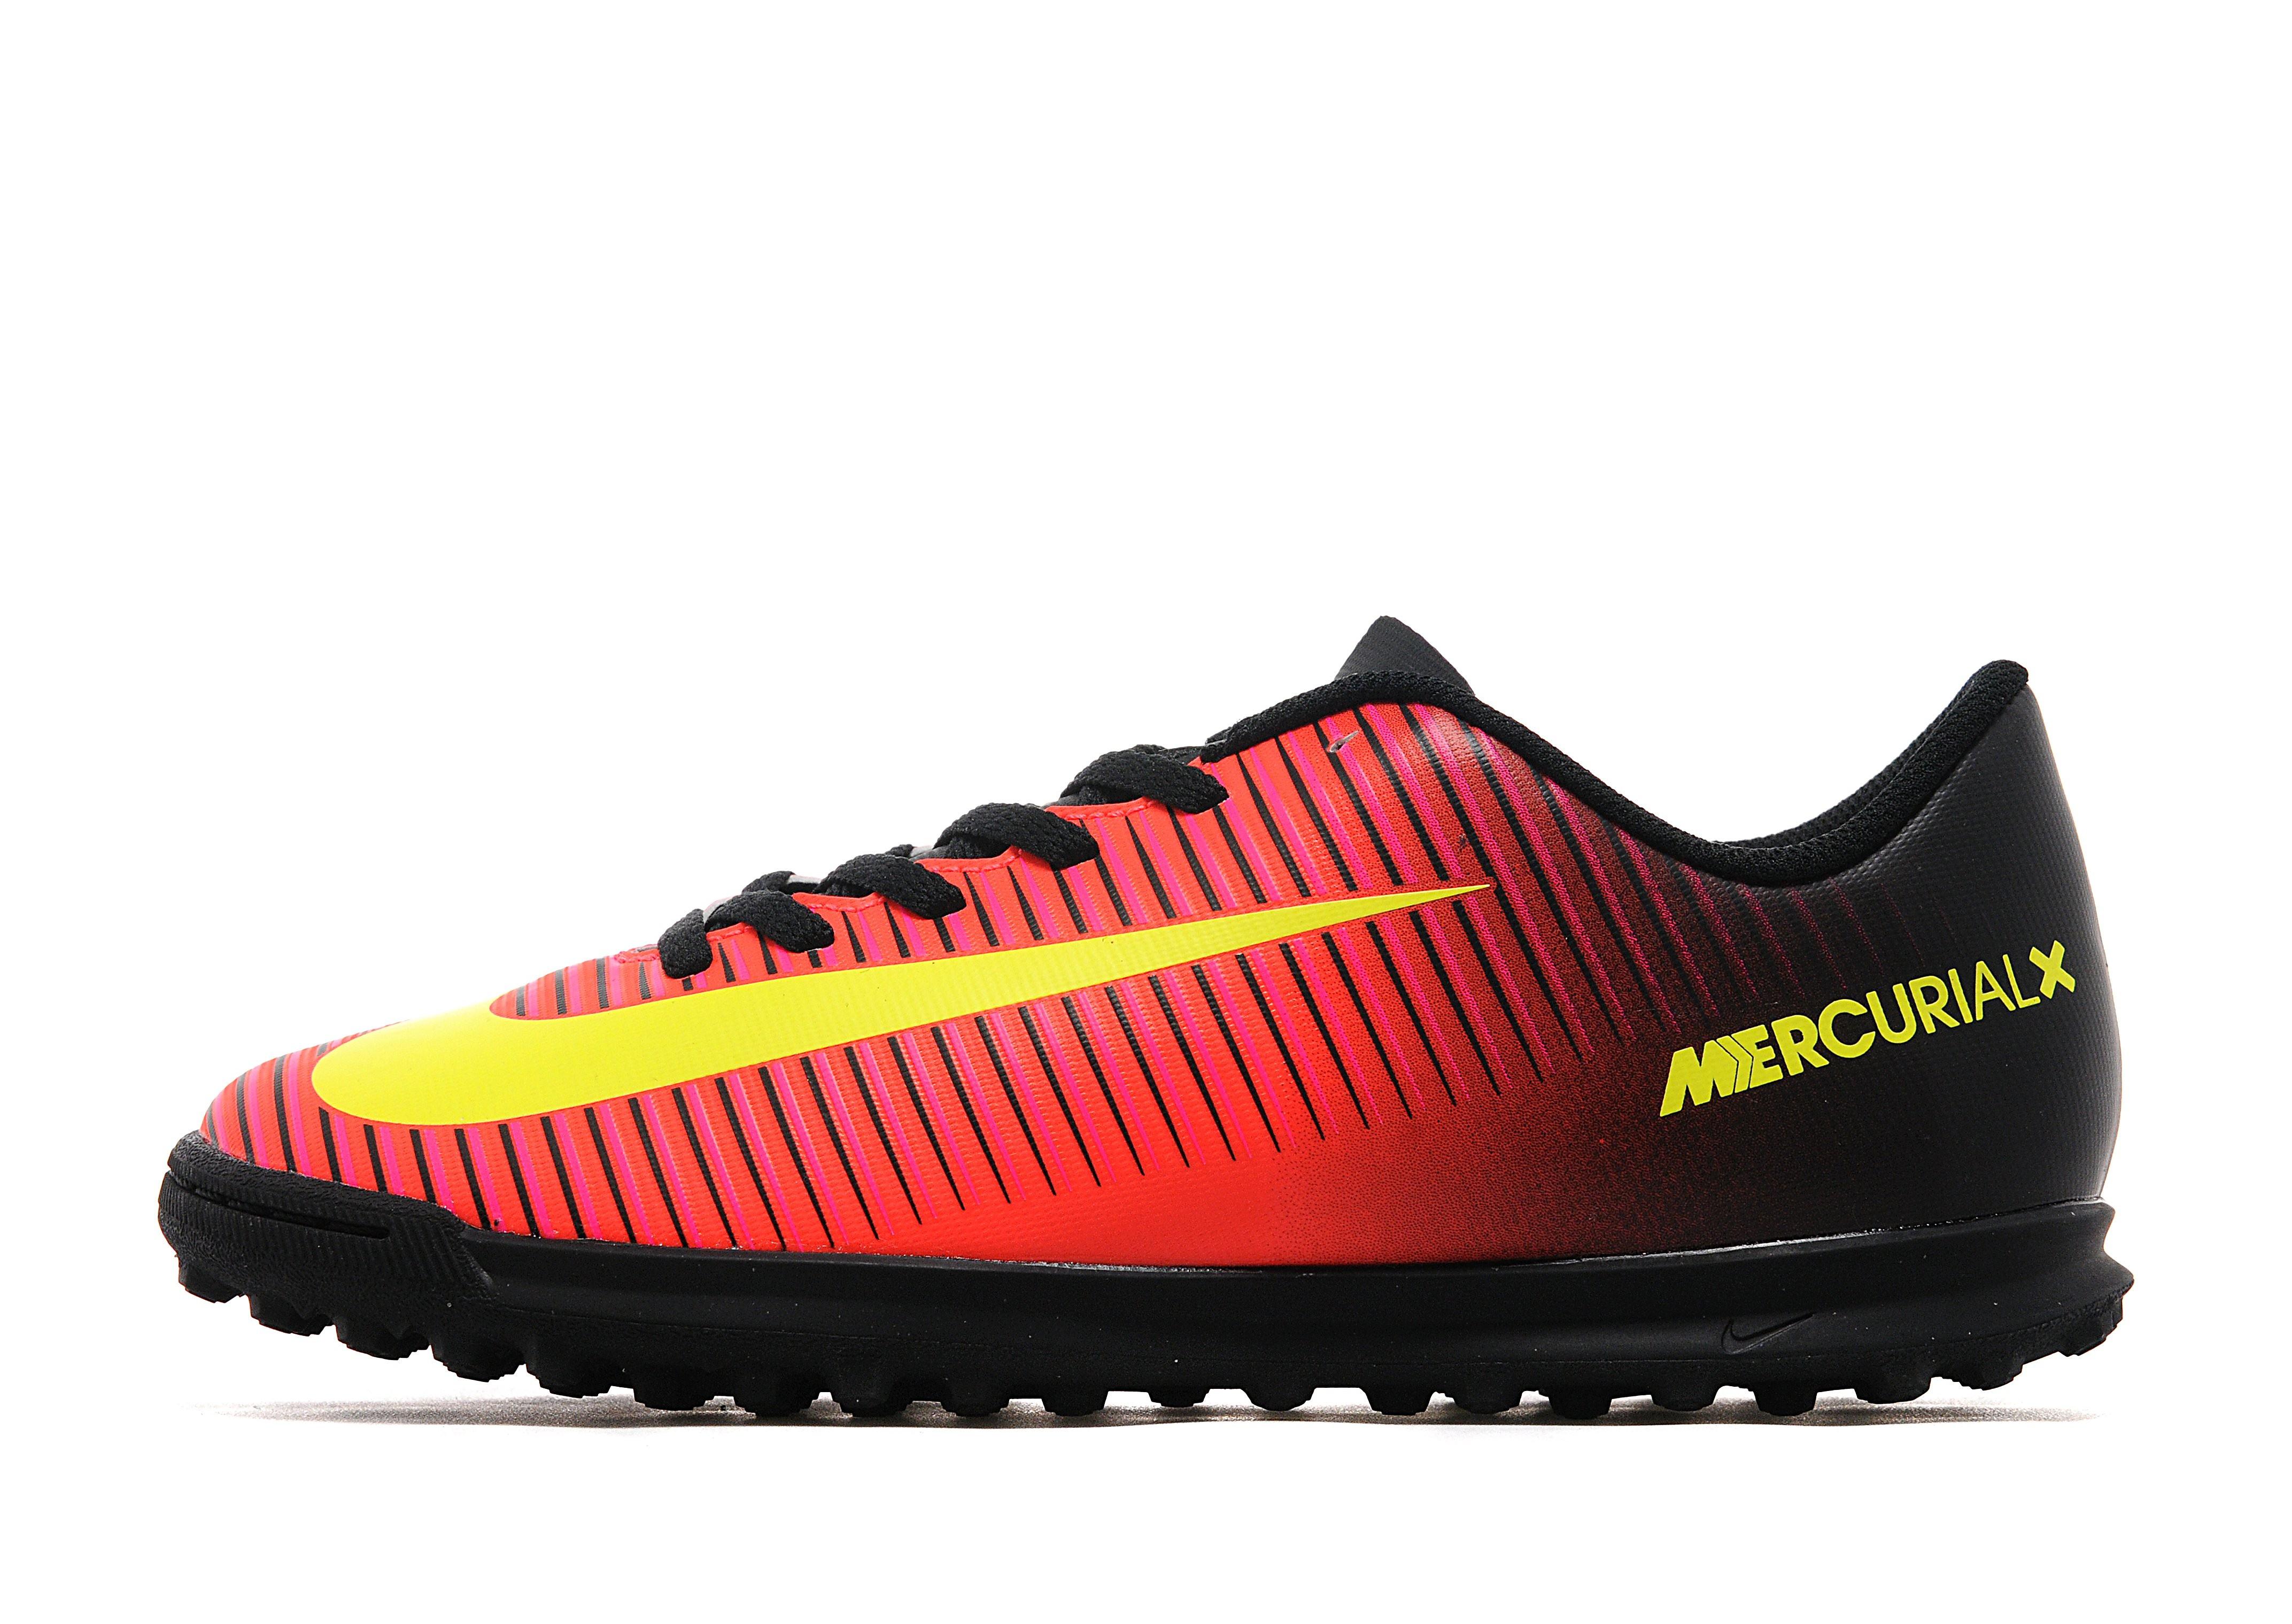 Nike Spark Brilliance Mercurial Vortex III TF Junior